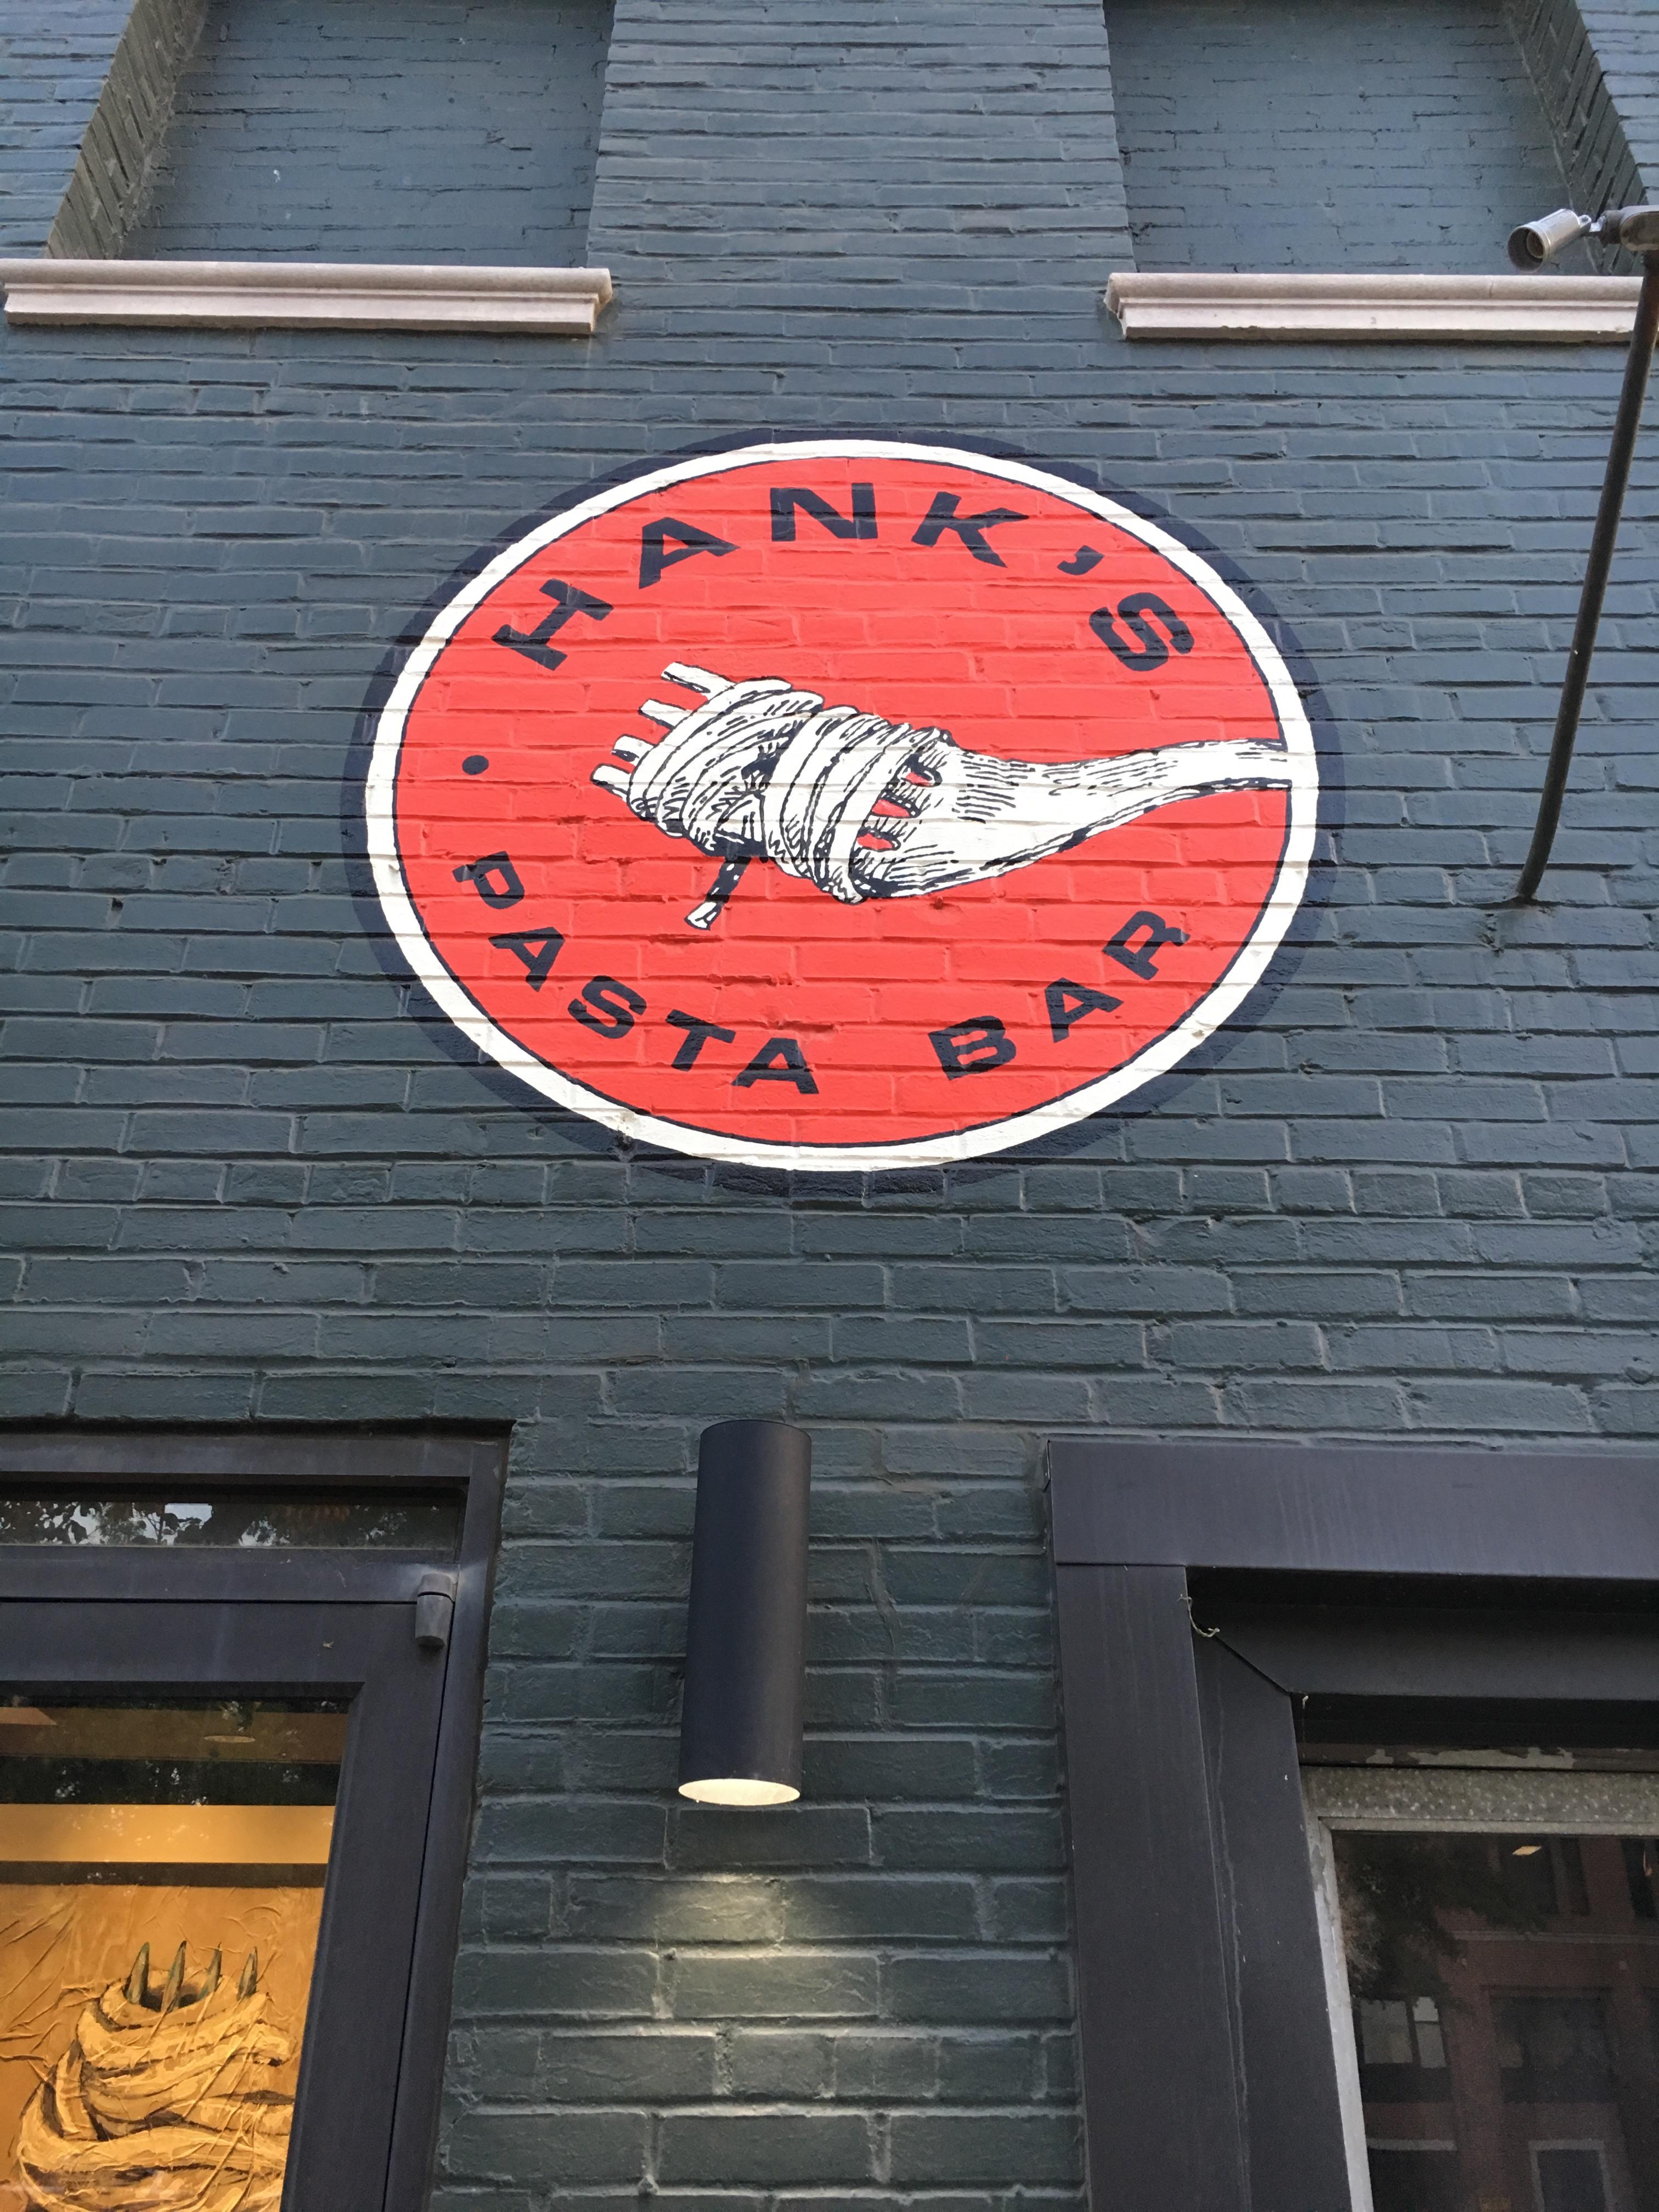 Hank S Pasta Bar Old Town Crier